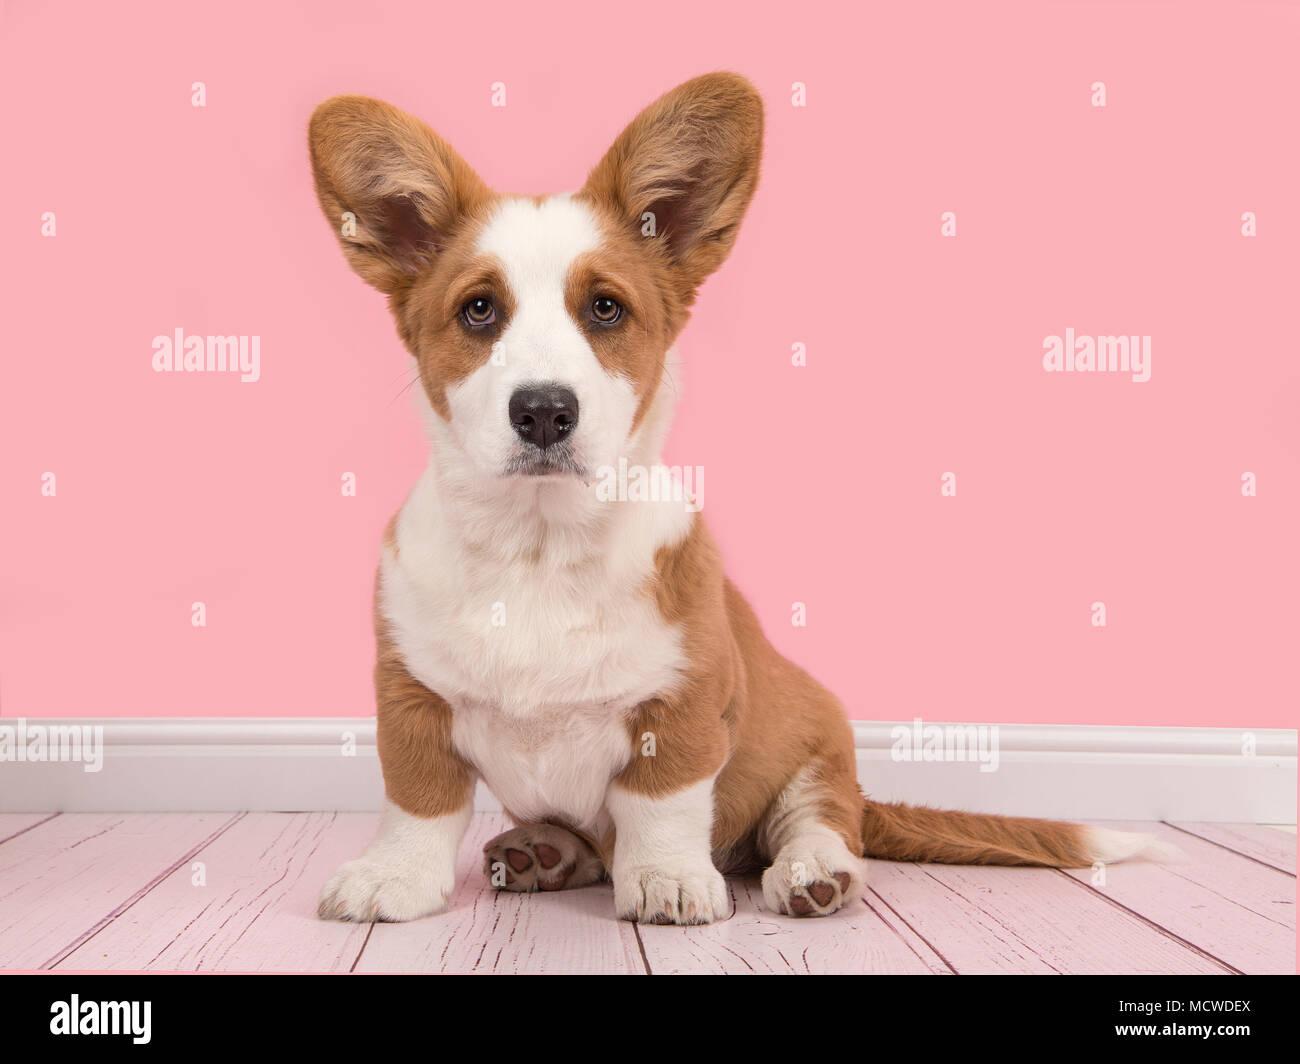 Cute Welsh Corgi pembroke cachorro sentado mirando la cámara en un salón rosa Foto de stock